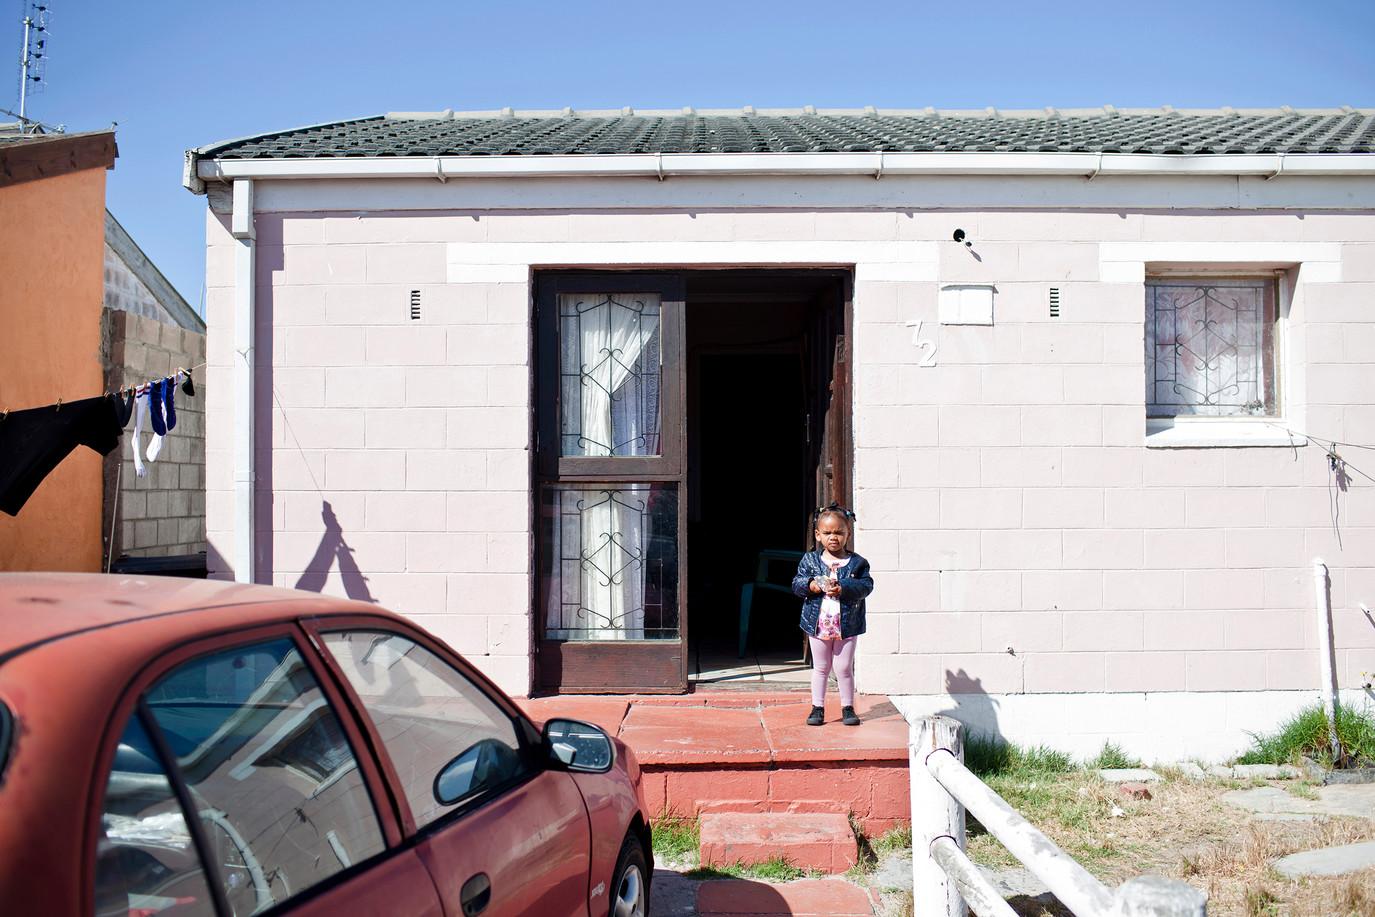 NGO_CSR-RLABS-South Africa 004.jpg